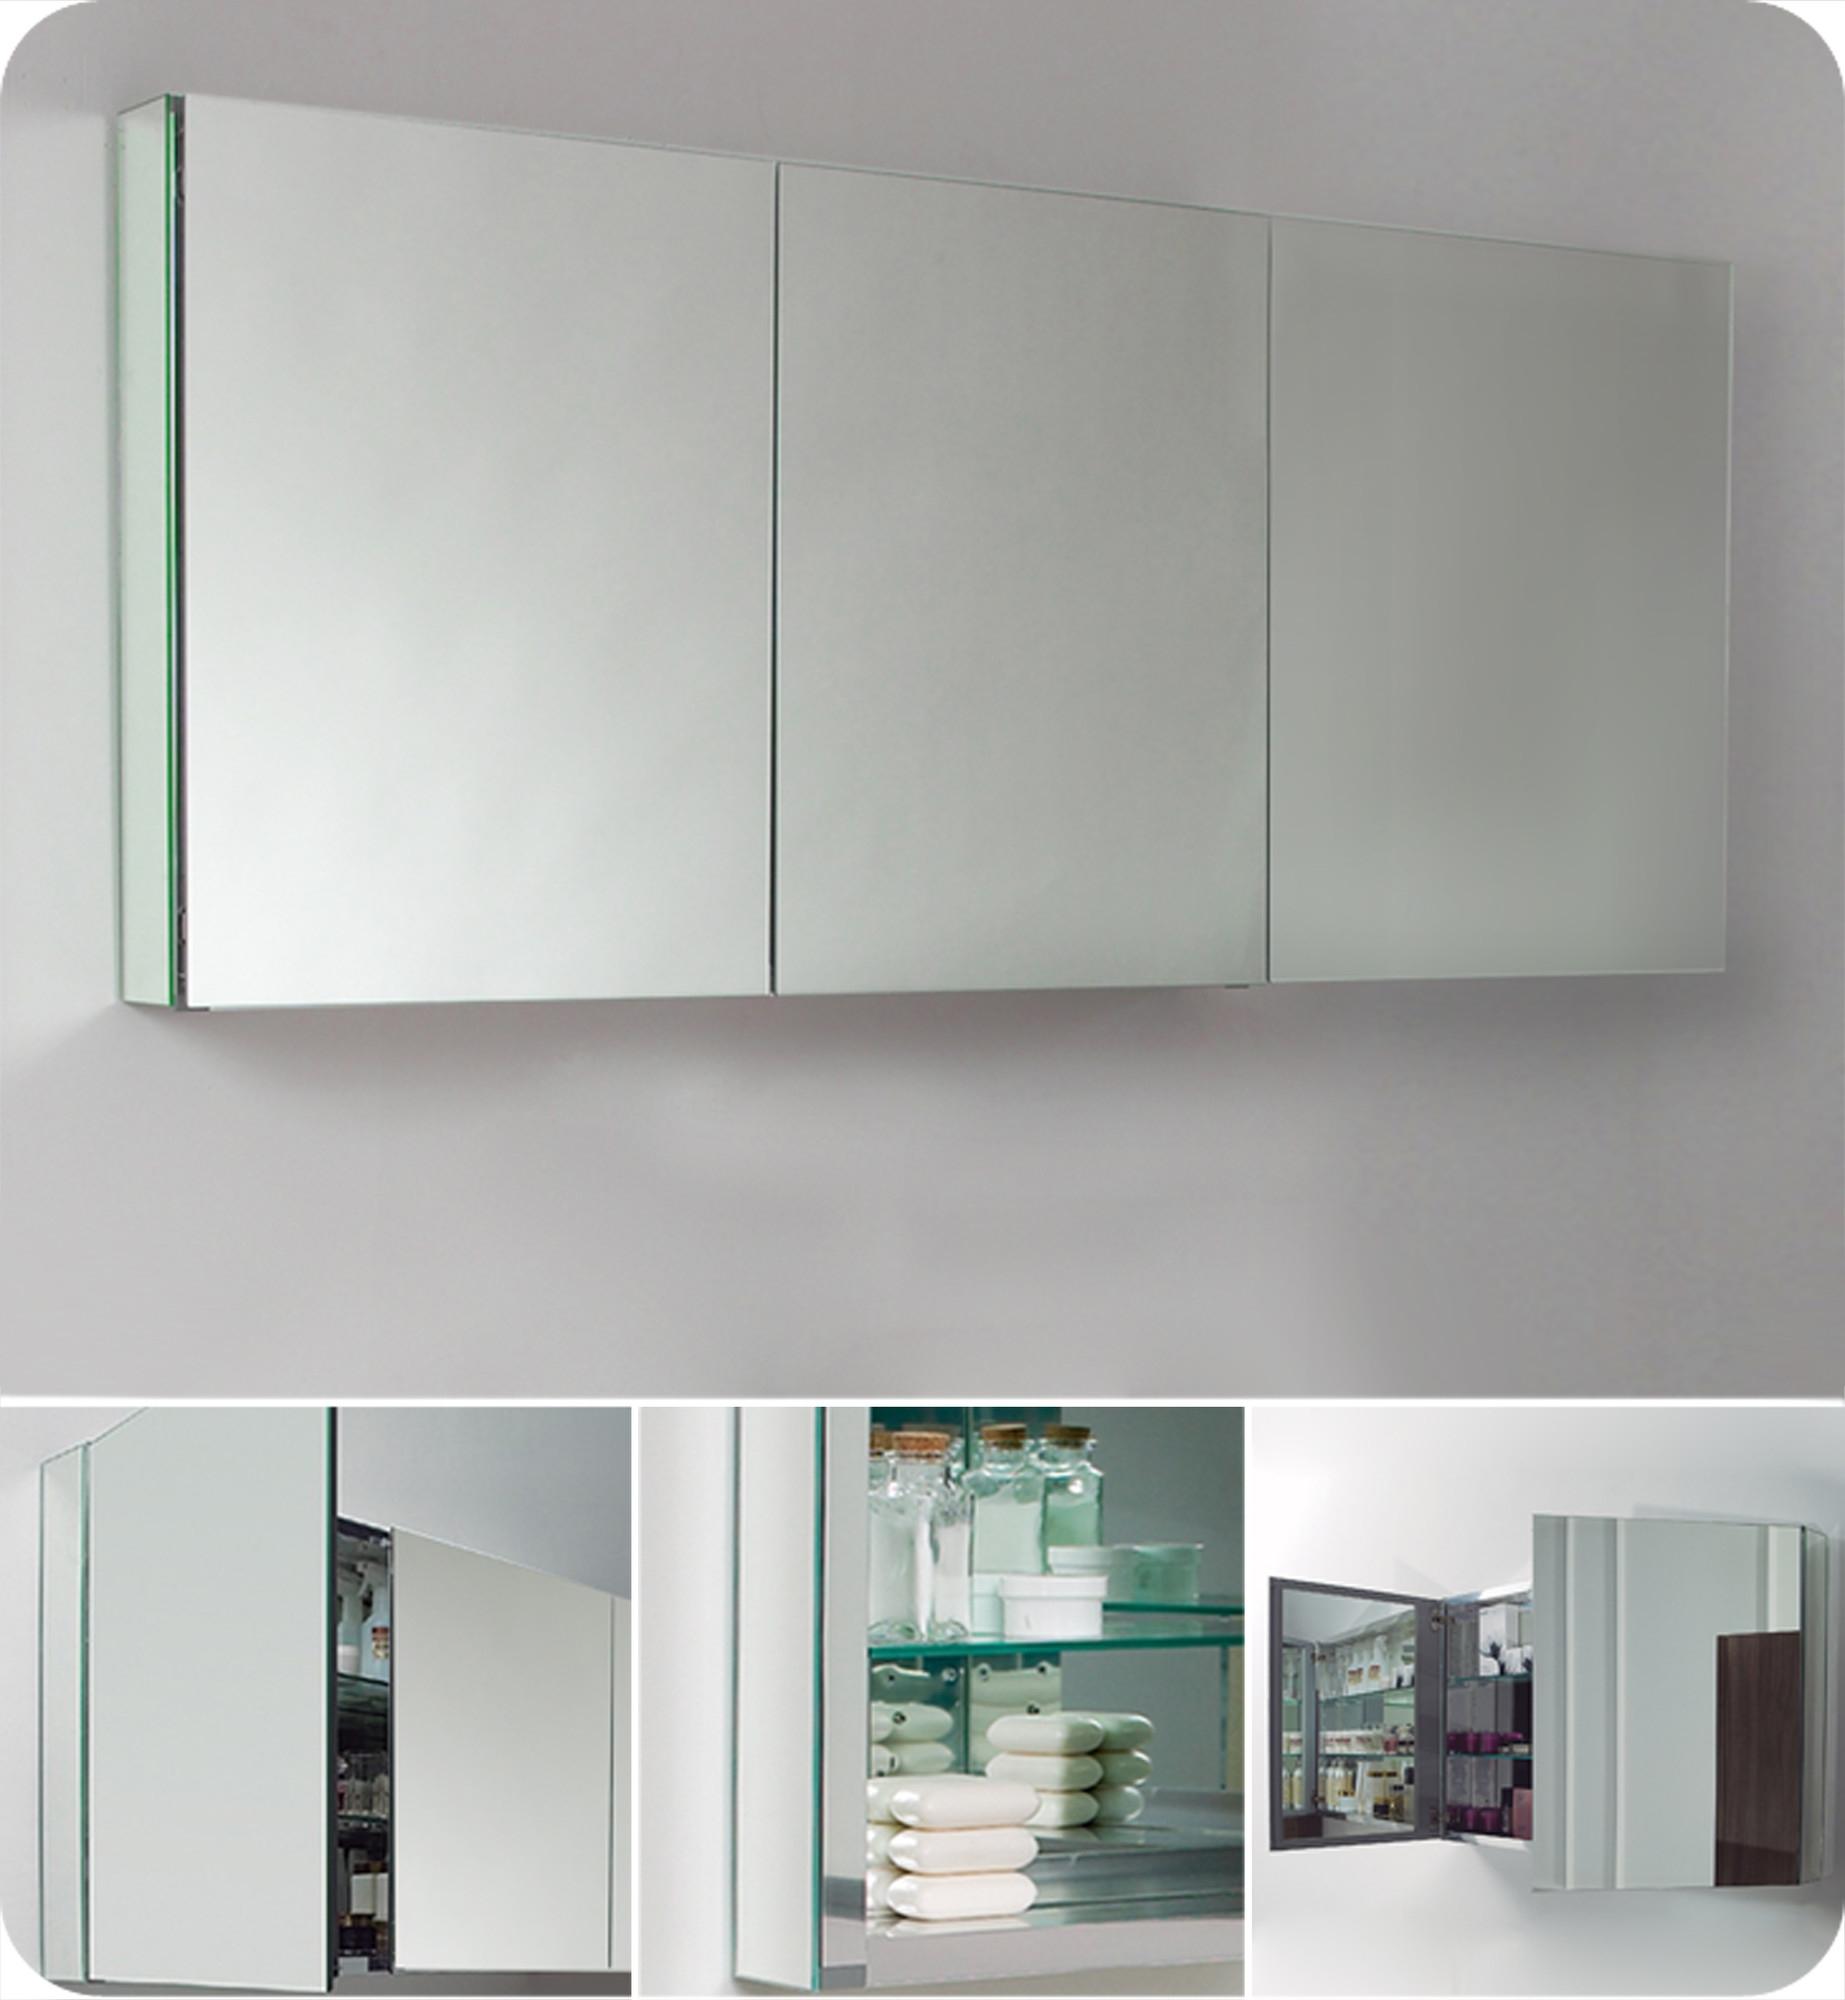 Fresca Small Bathroom Medicine Cabinet With Mirrors1845 X 2000